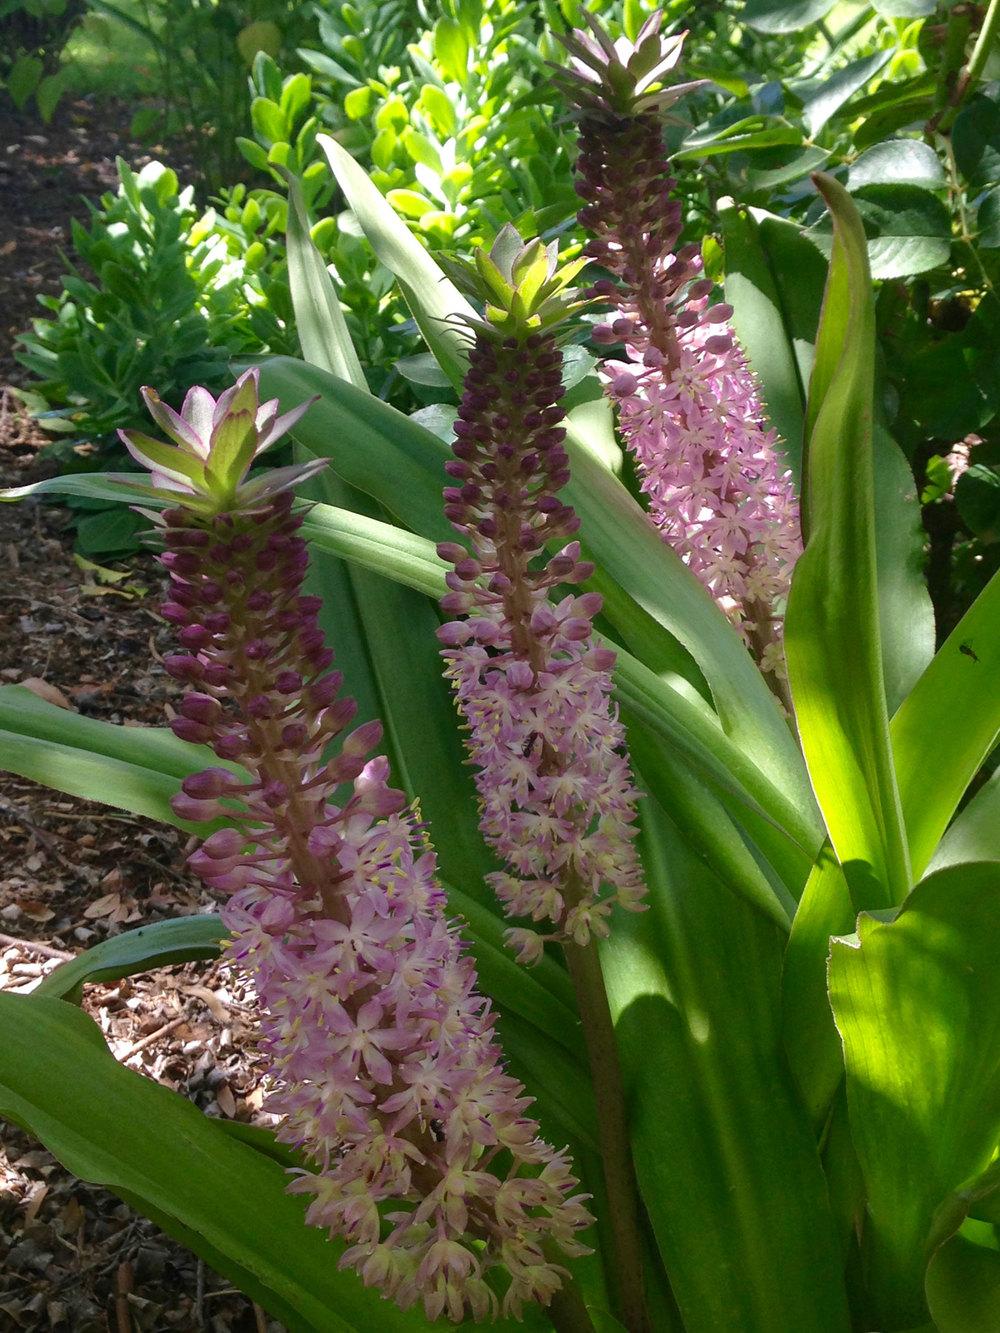 Pineapple lily ( Eucomis comosa  'Sparking Burgundy')